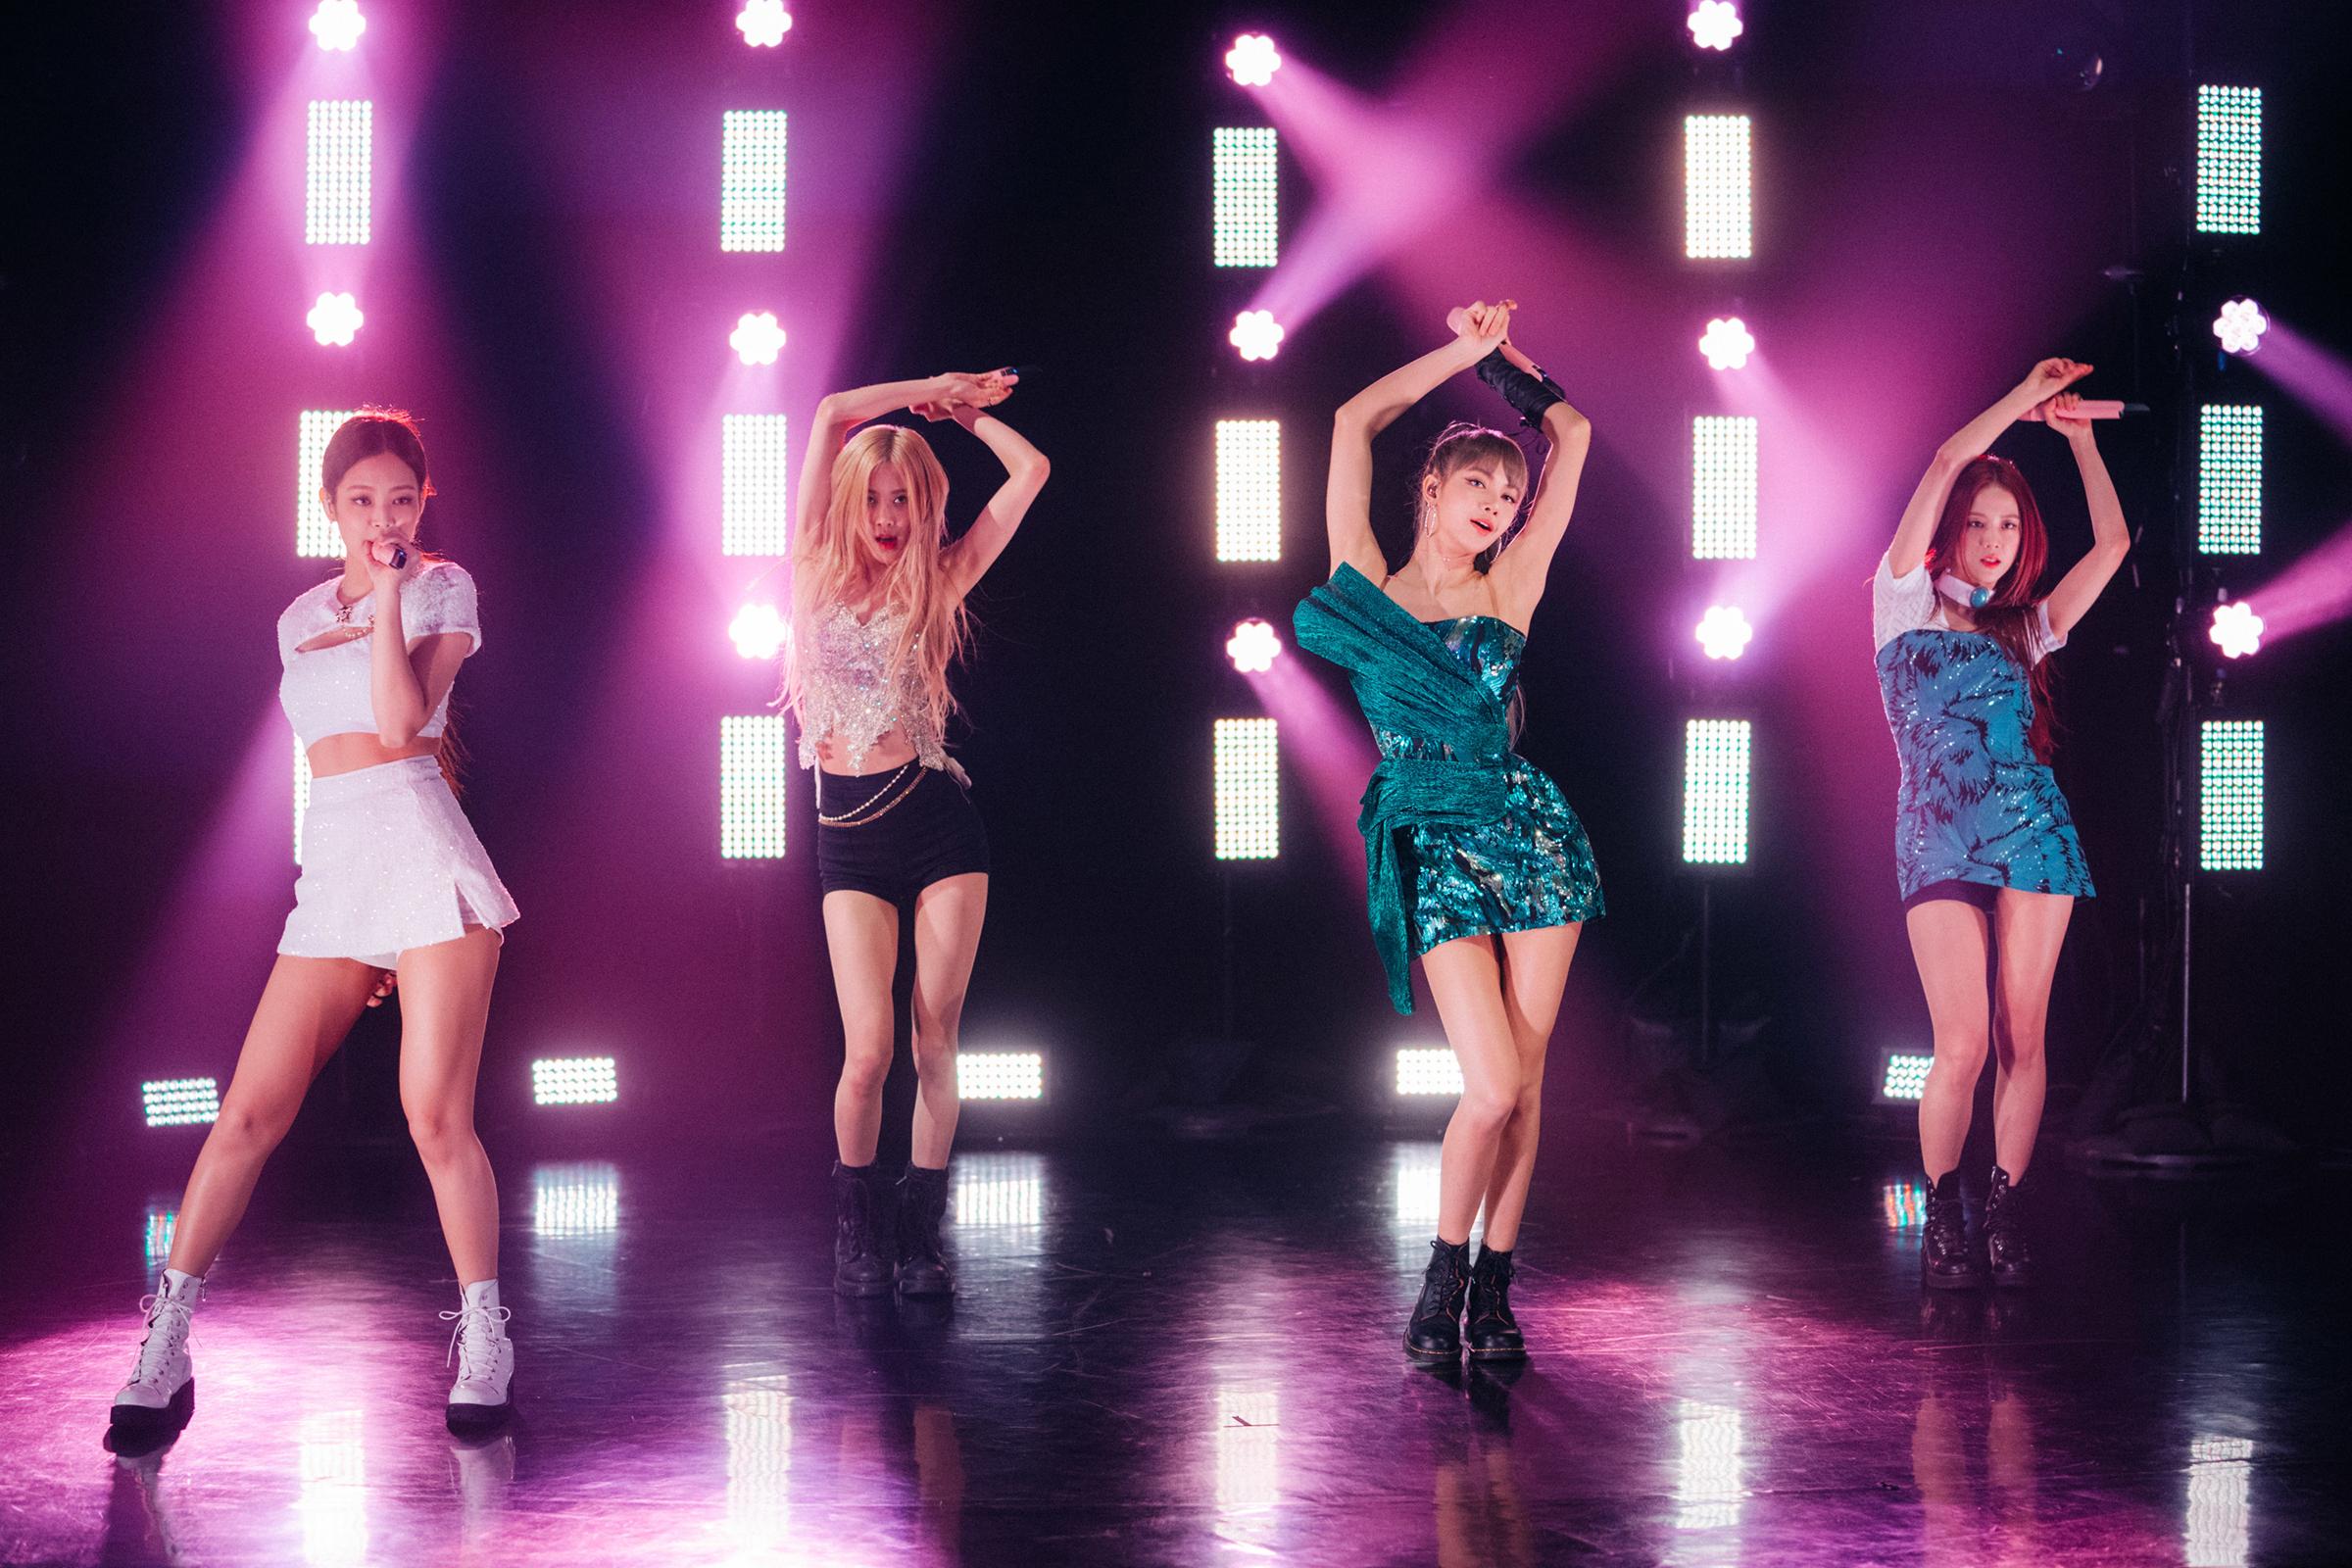 K-Pop Sensations Blackpink Perform 'Kill This Love' on